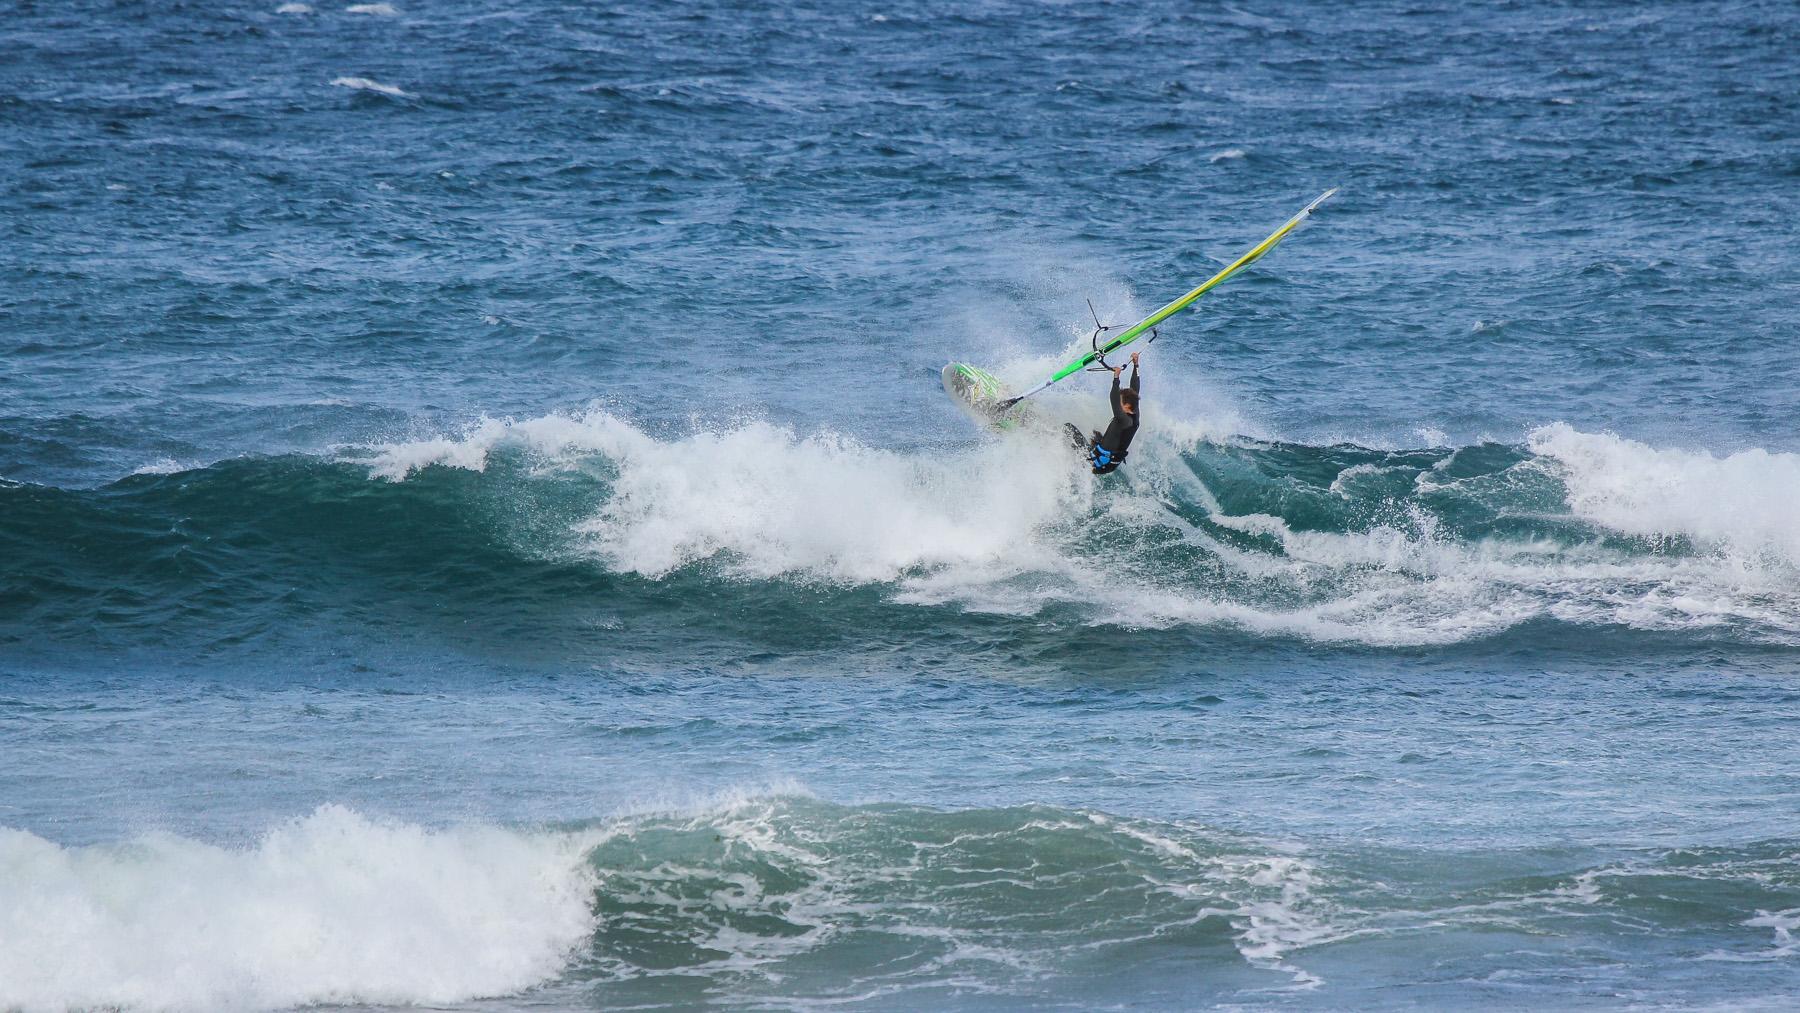 alastair mcleod windsurfing sandy point front beach